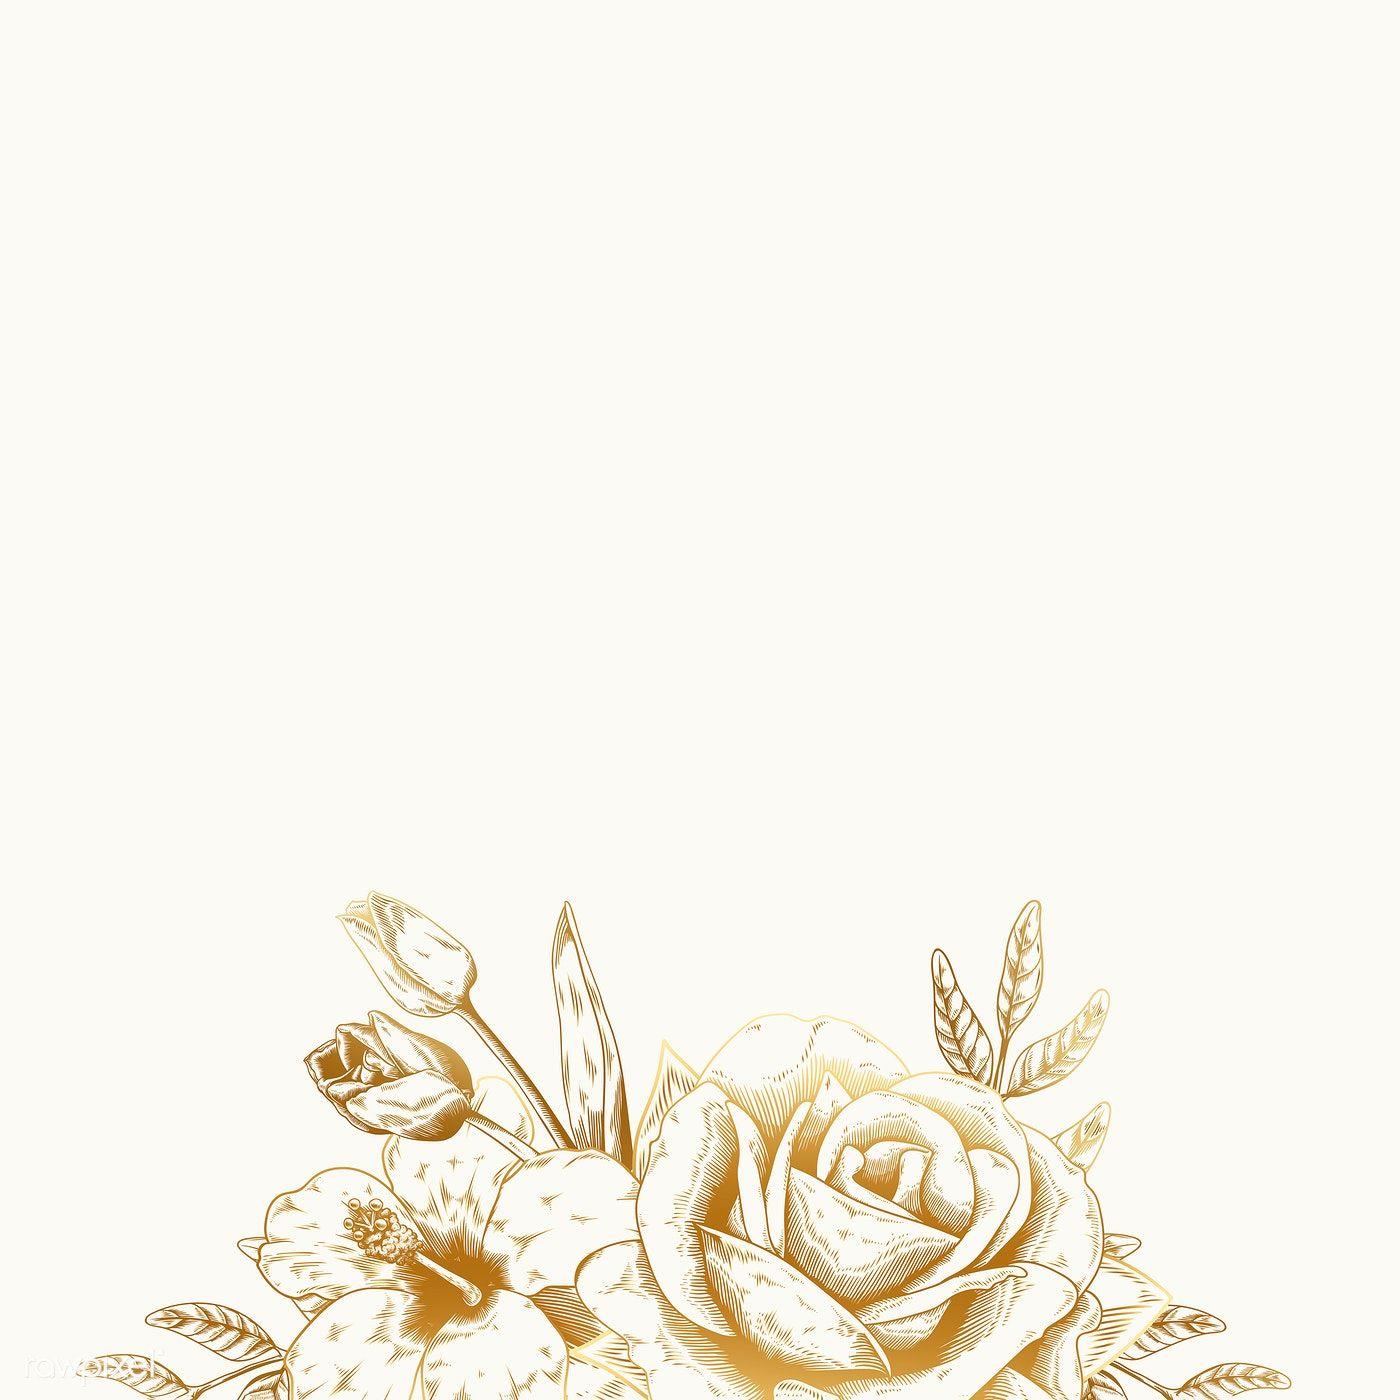 Hand Drawn Rose Framed Background Vector Free Image By Rawpixel Com Aum Vintage Floral Backgrounds Floral Background Line Art Flowers